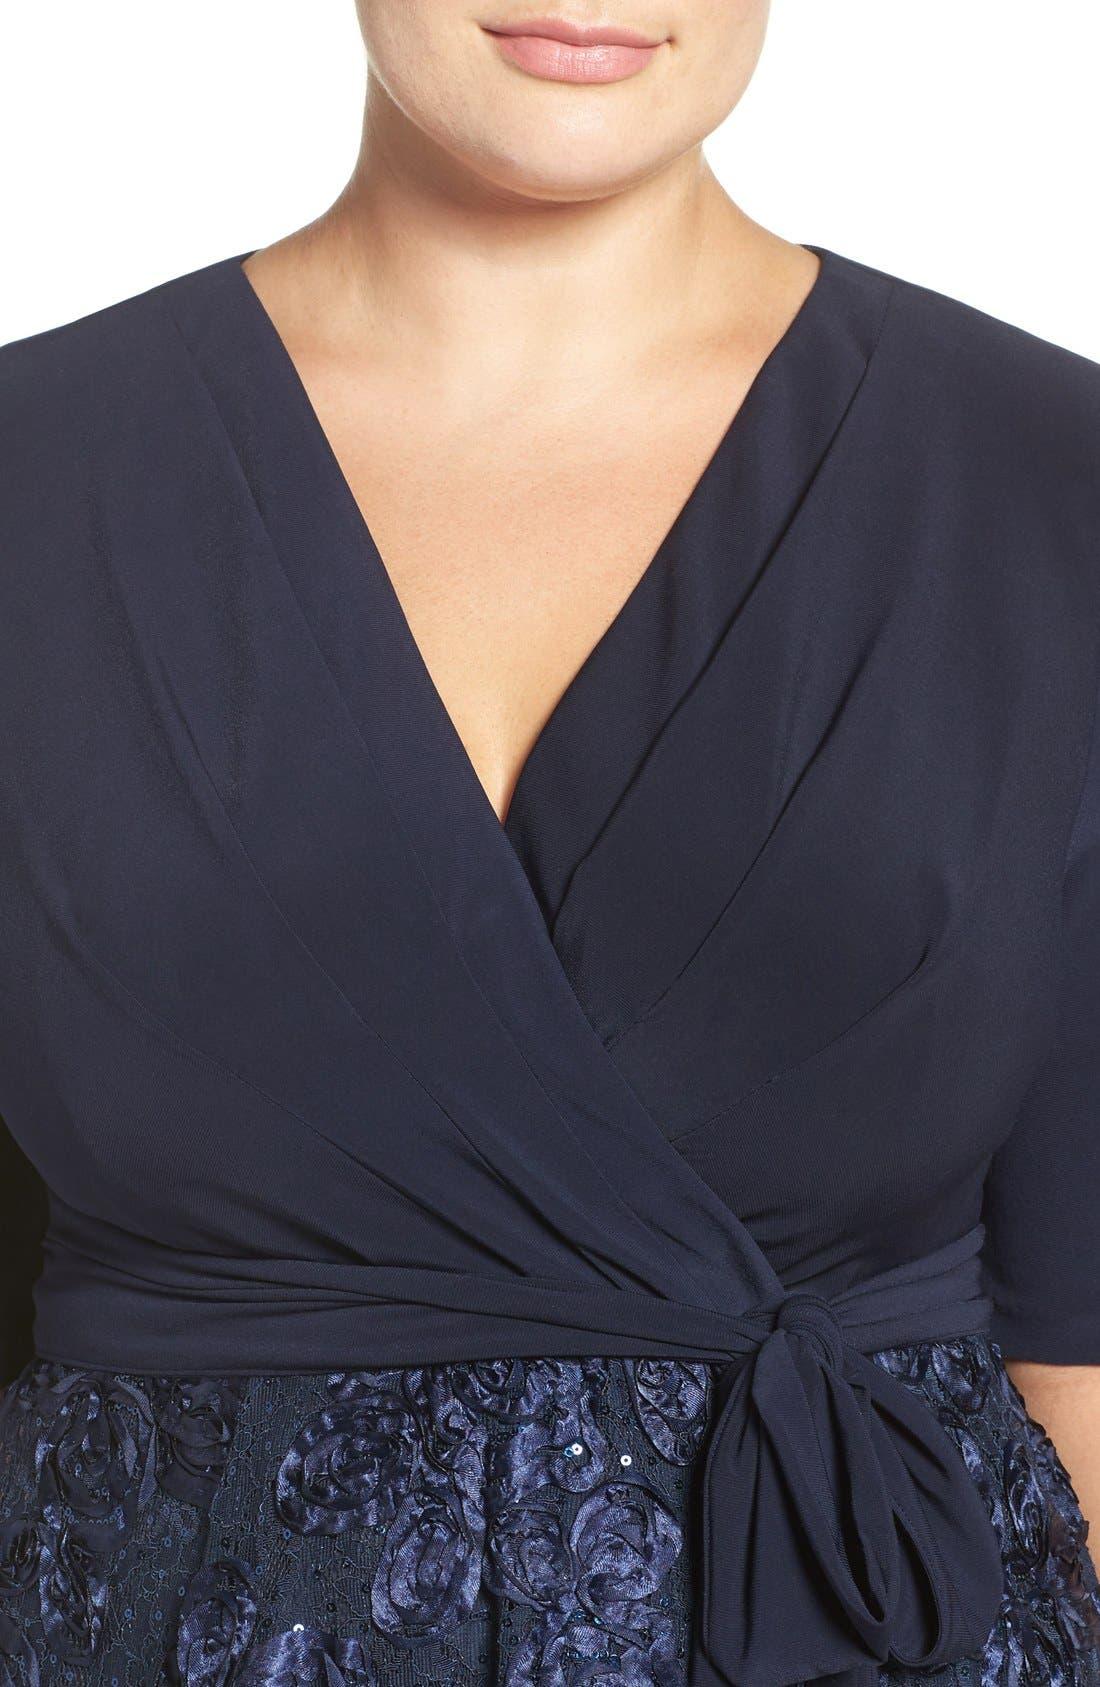 Tea Length Jersey & Rosette Lace Dress,                             Alternate thumbnail 5, color,                             Navy